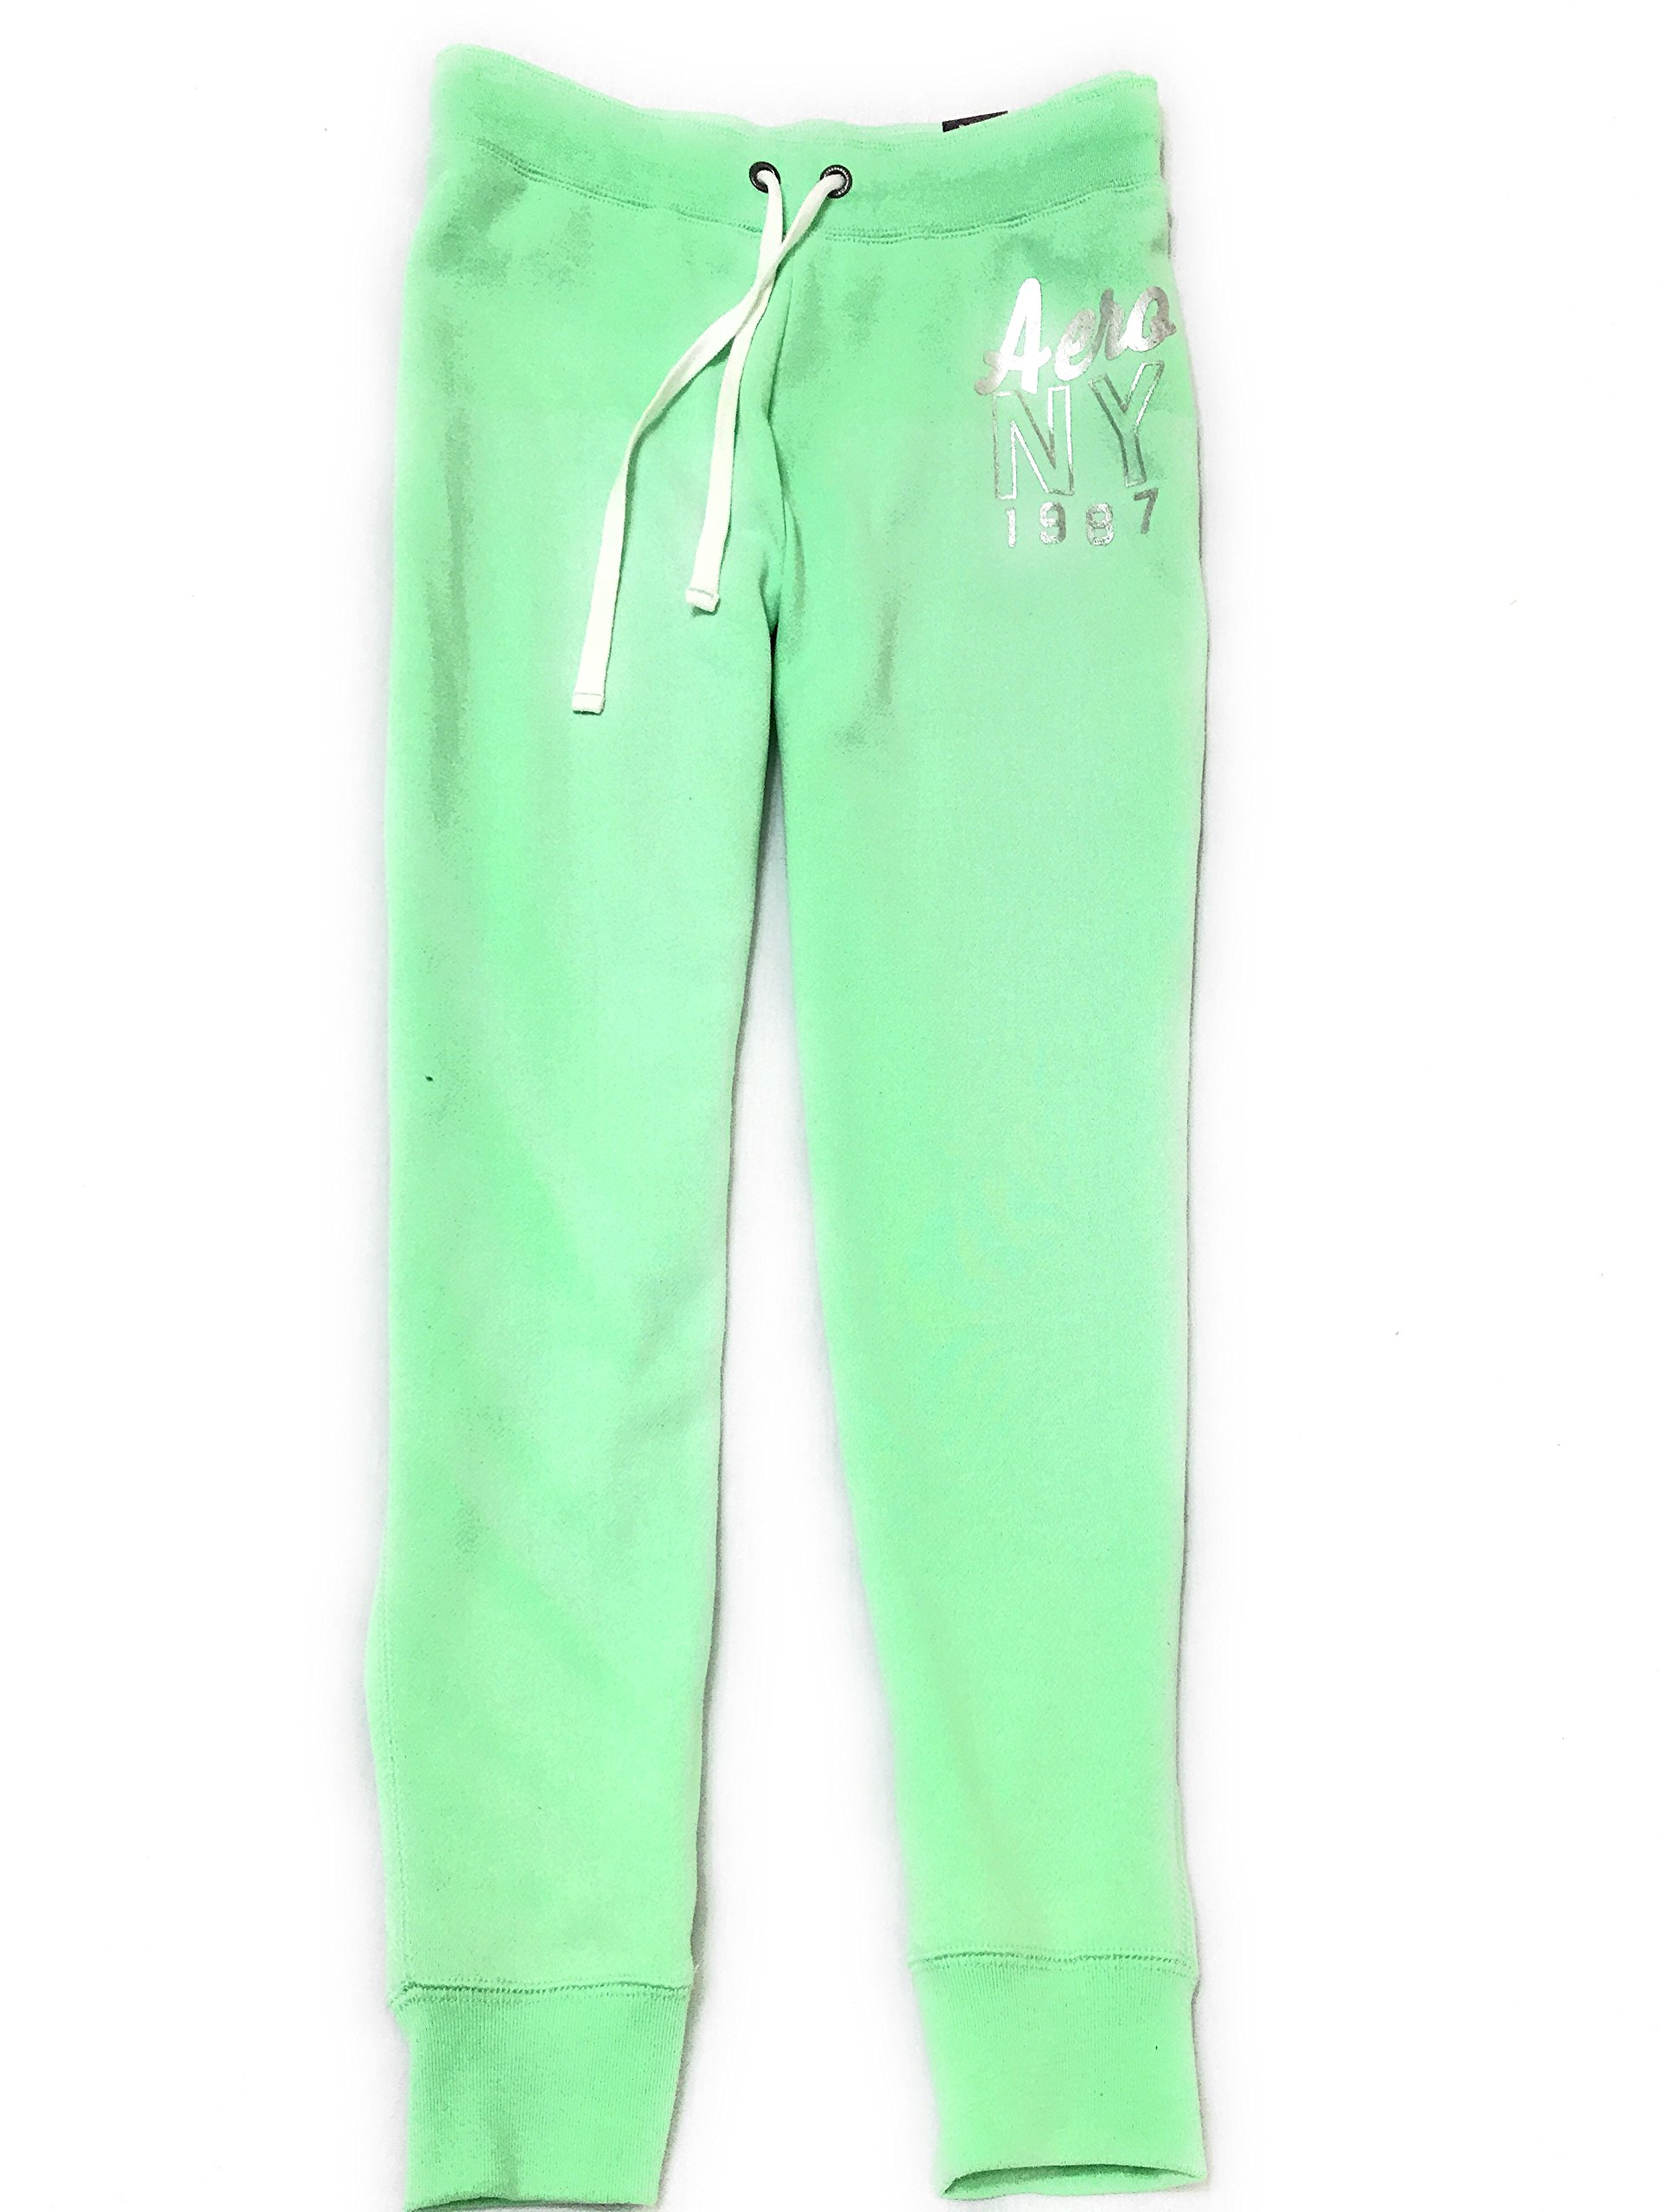 Aeropostale Women's Jogger Pants With Aero NY 1987 Logo Style 8804 (Large, Green 336)